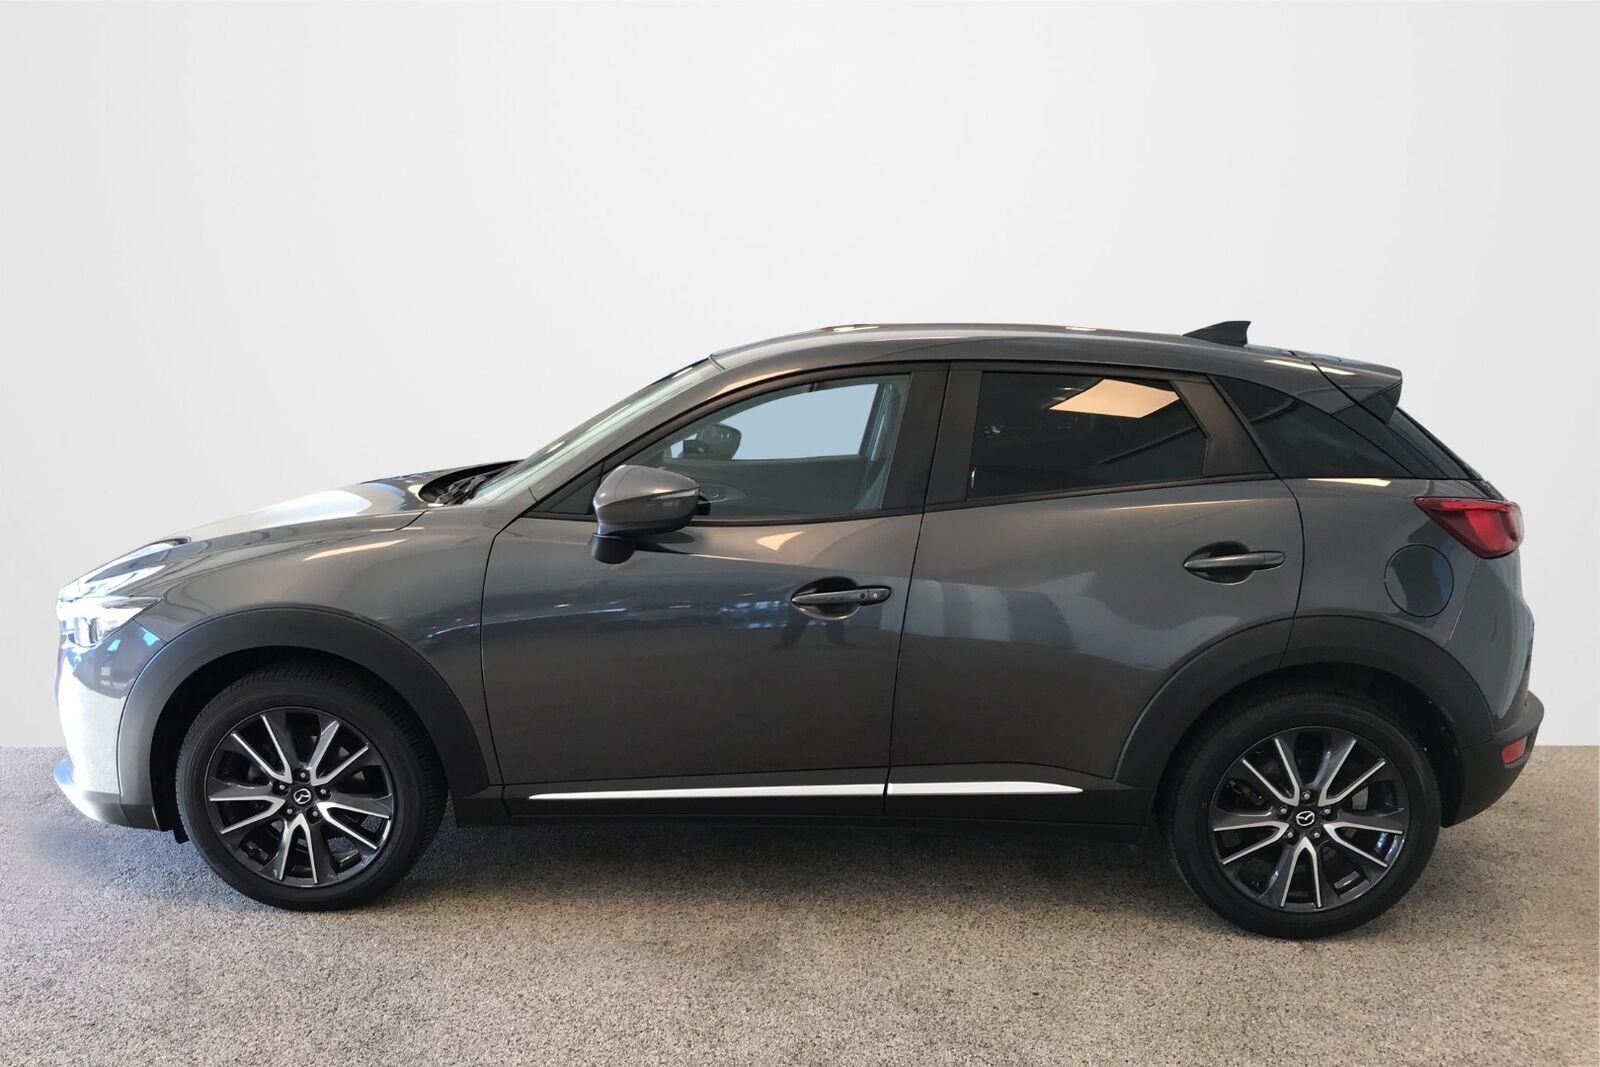 Mazda CX-3 2,0 Sky-G 120 Optimum aut. - billede 1